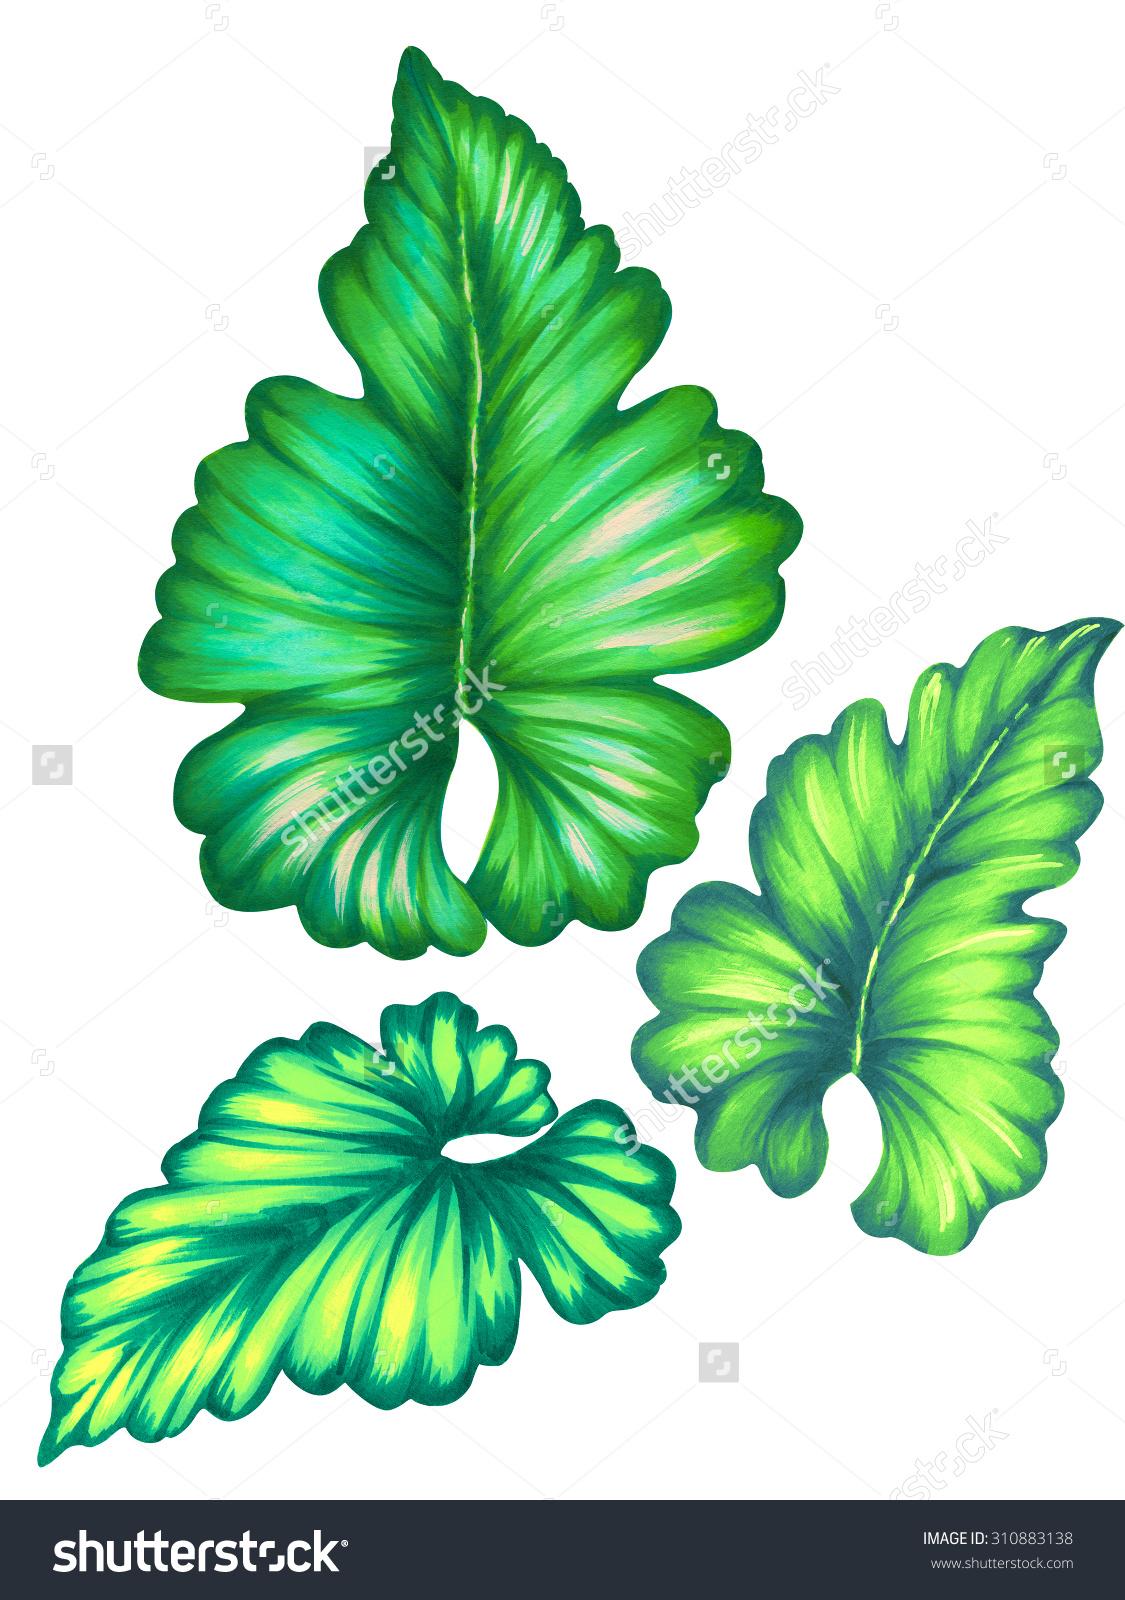 Set Isolated Detailed Tropical Leaves Caladium Stock Illustration.